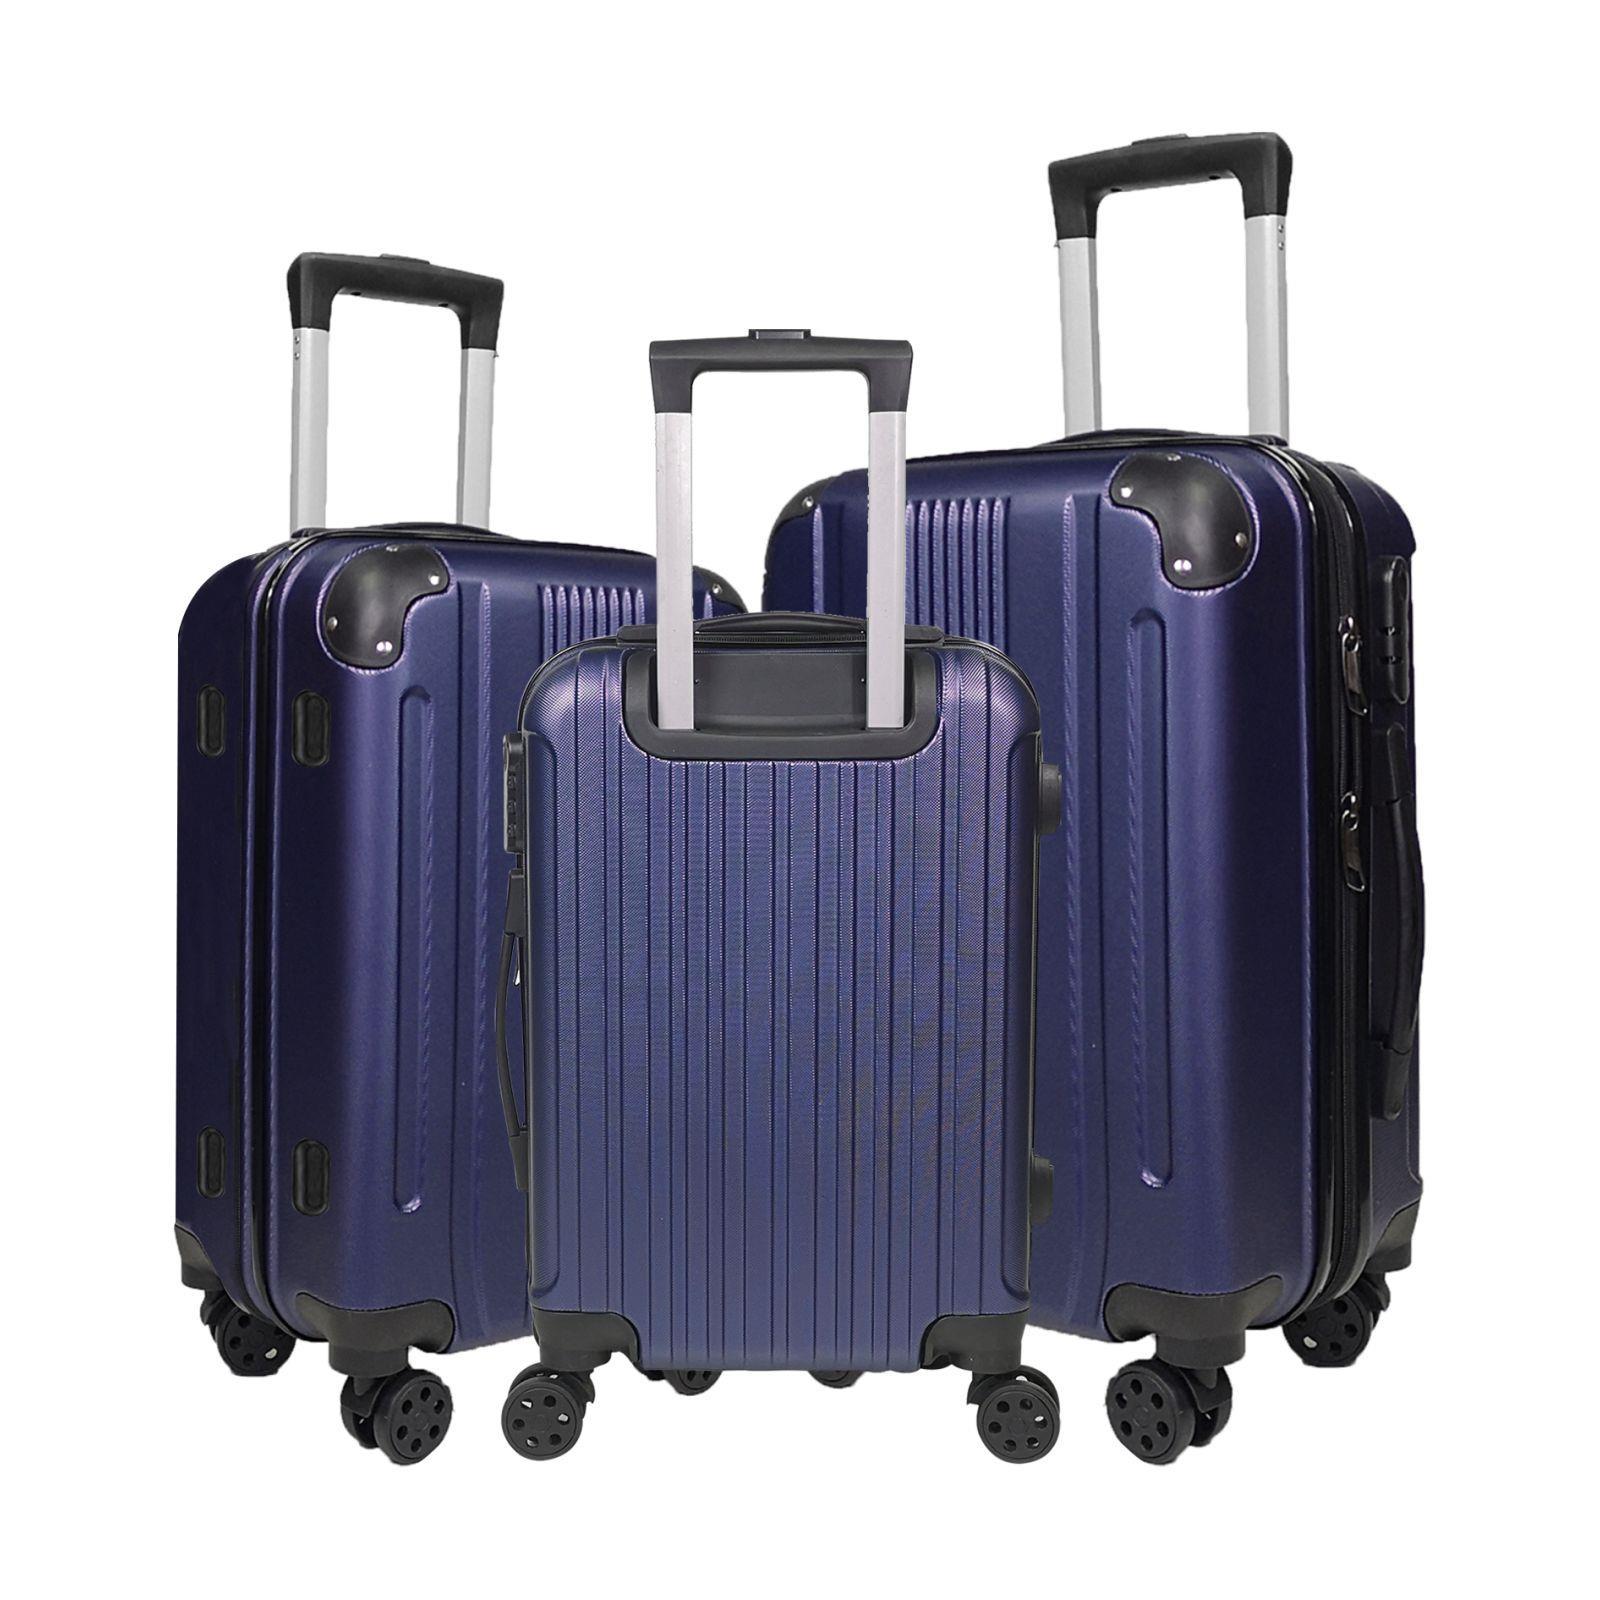 Coque Rigide Cabine Grande valise à 4 roues Léger Voyage Chariot Bagage